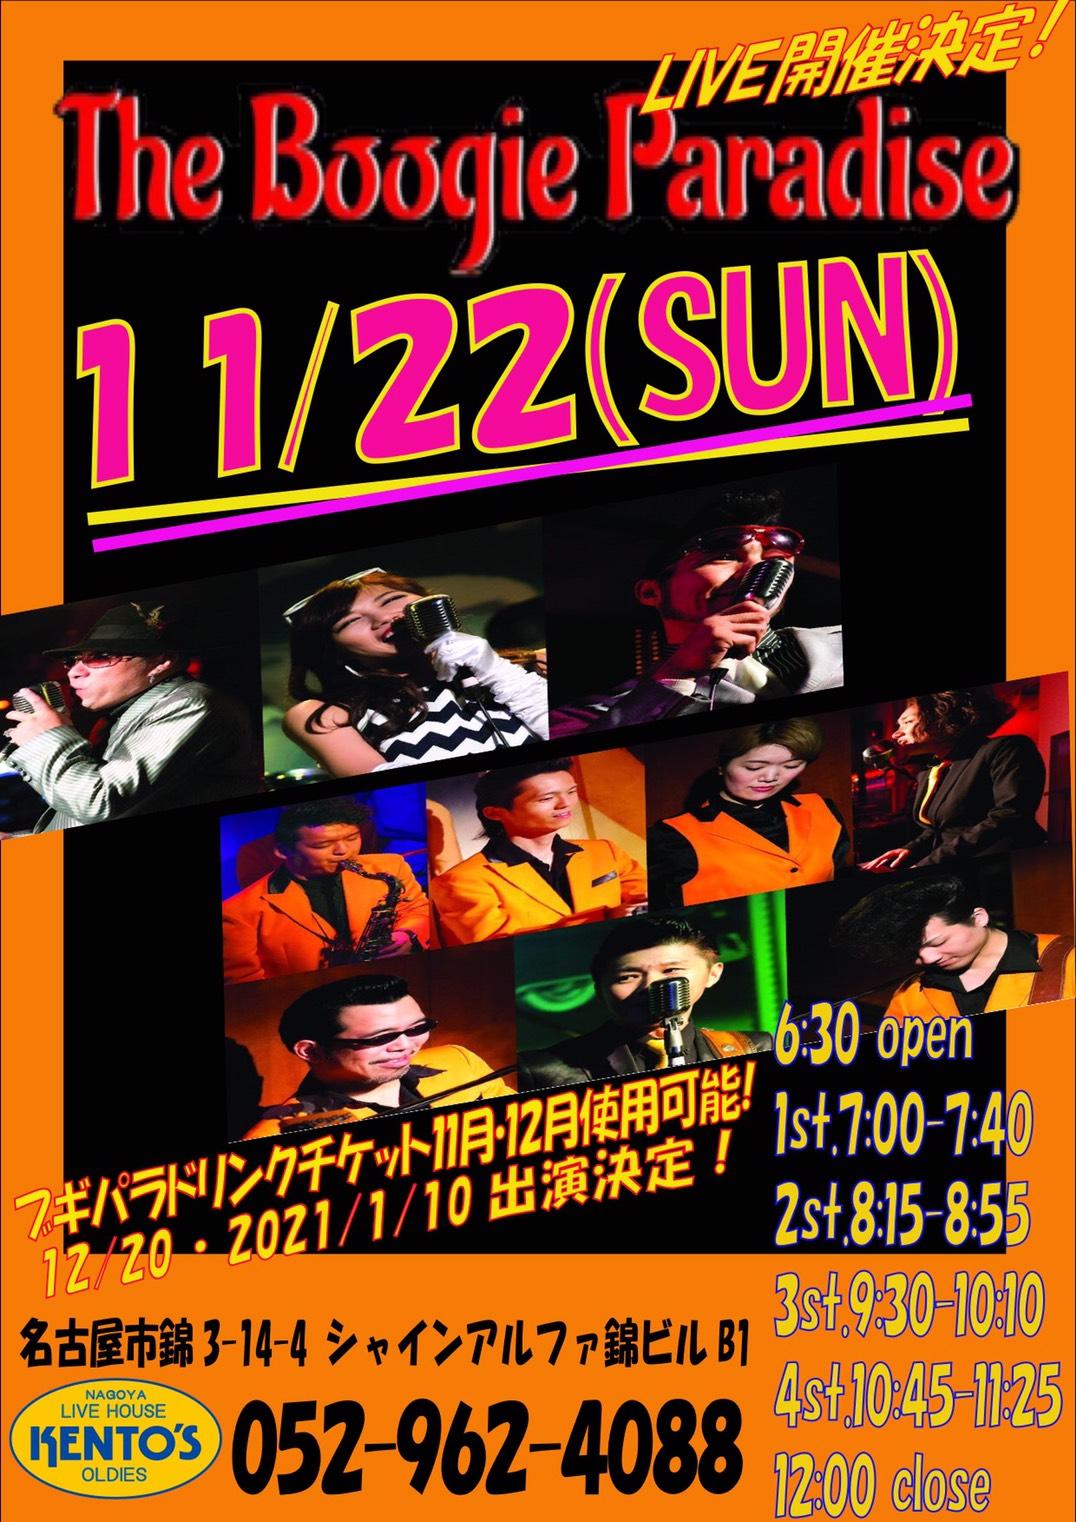 ★11月22日(日)The Boogie Paradise